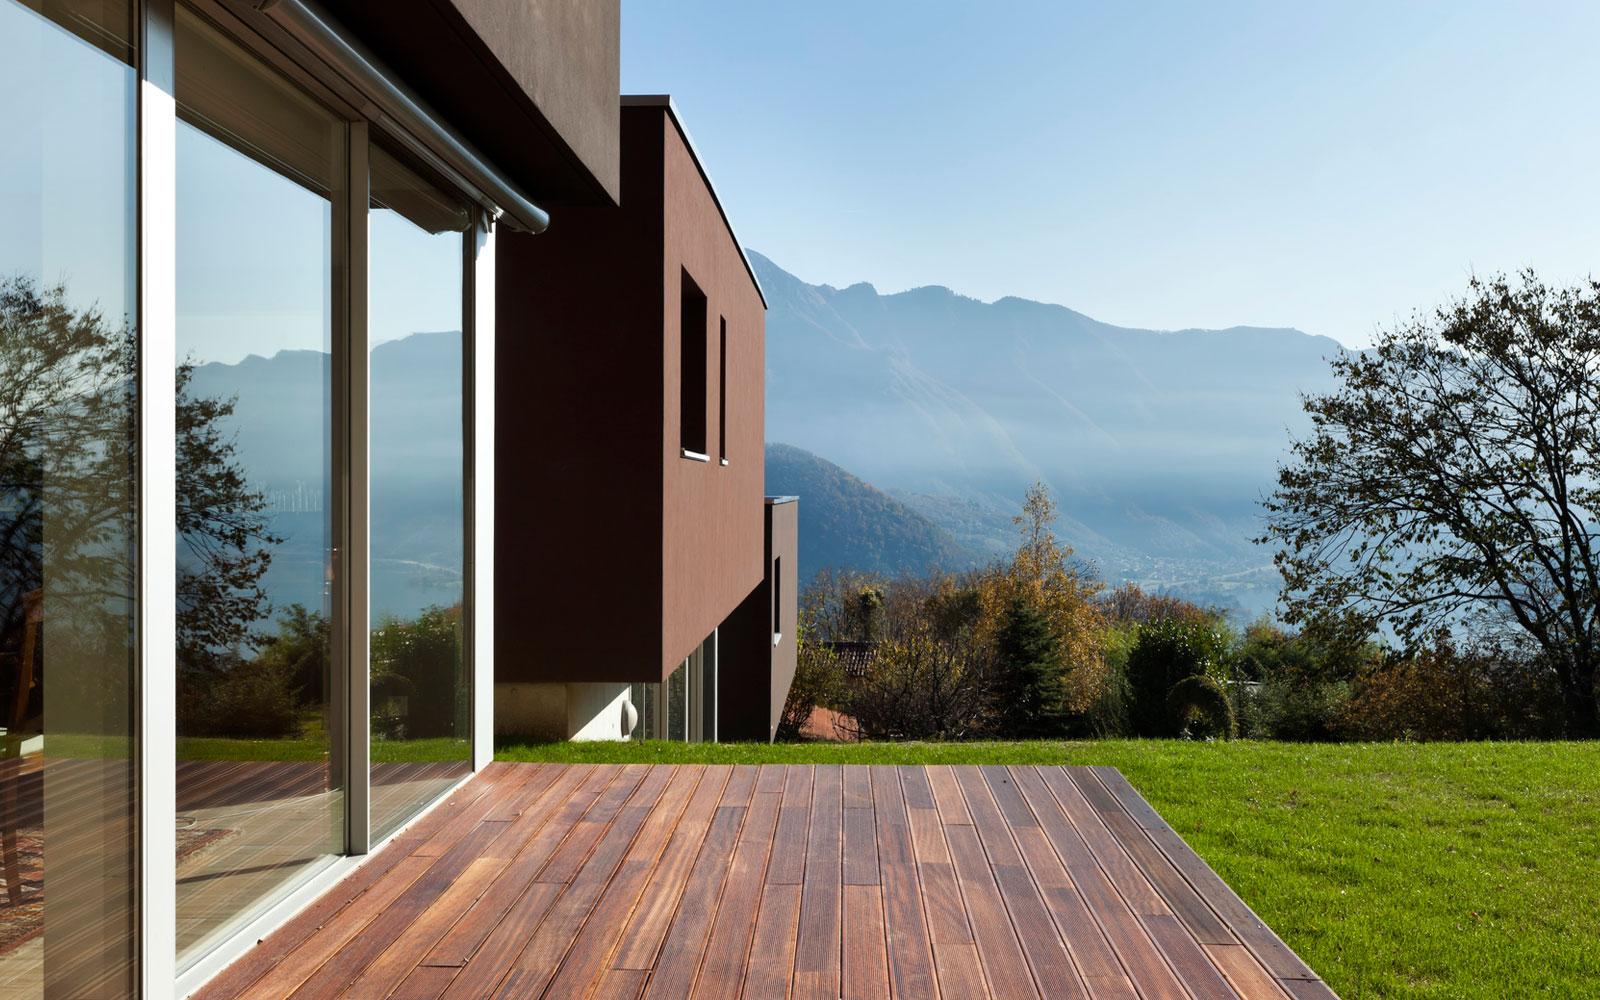 Mitterer Immobilien - Immobilienverkauf